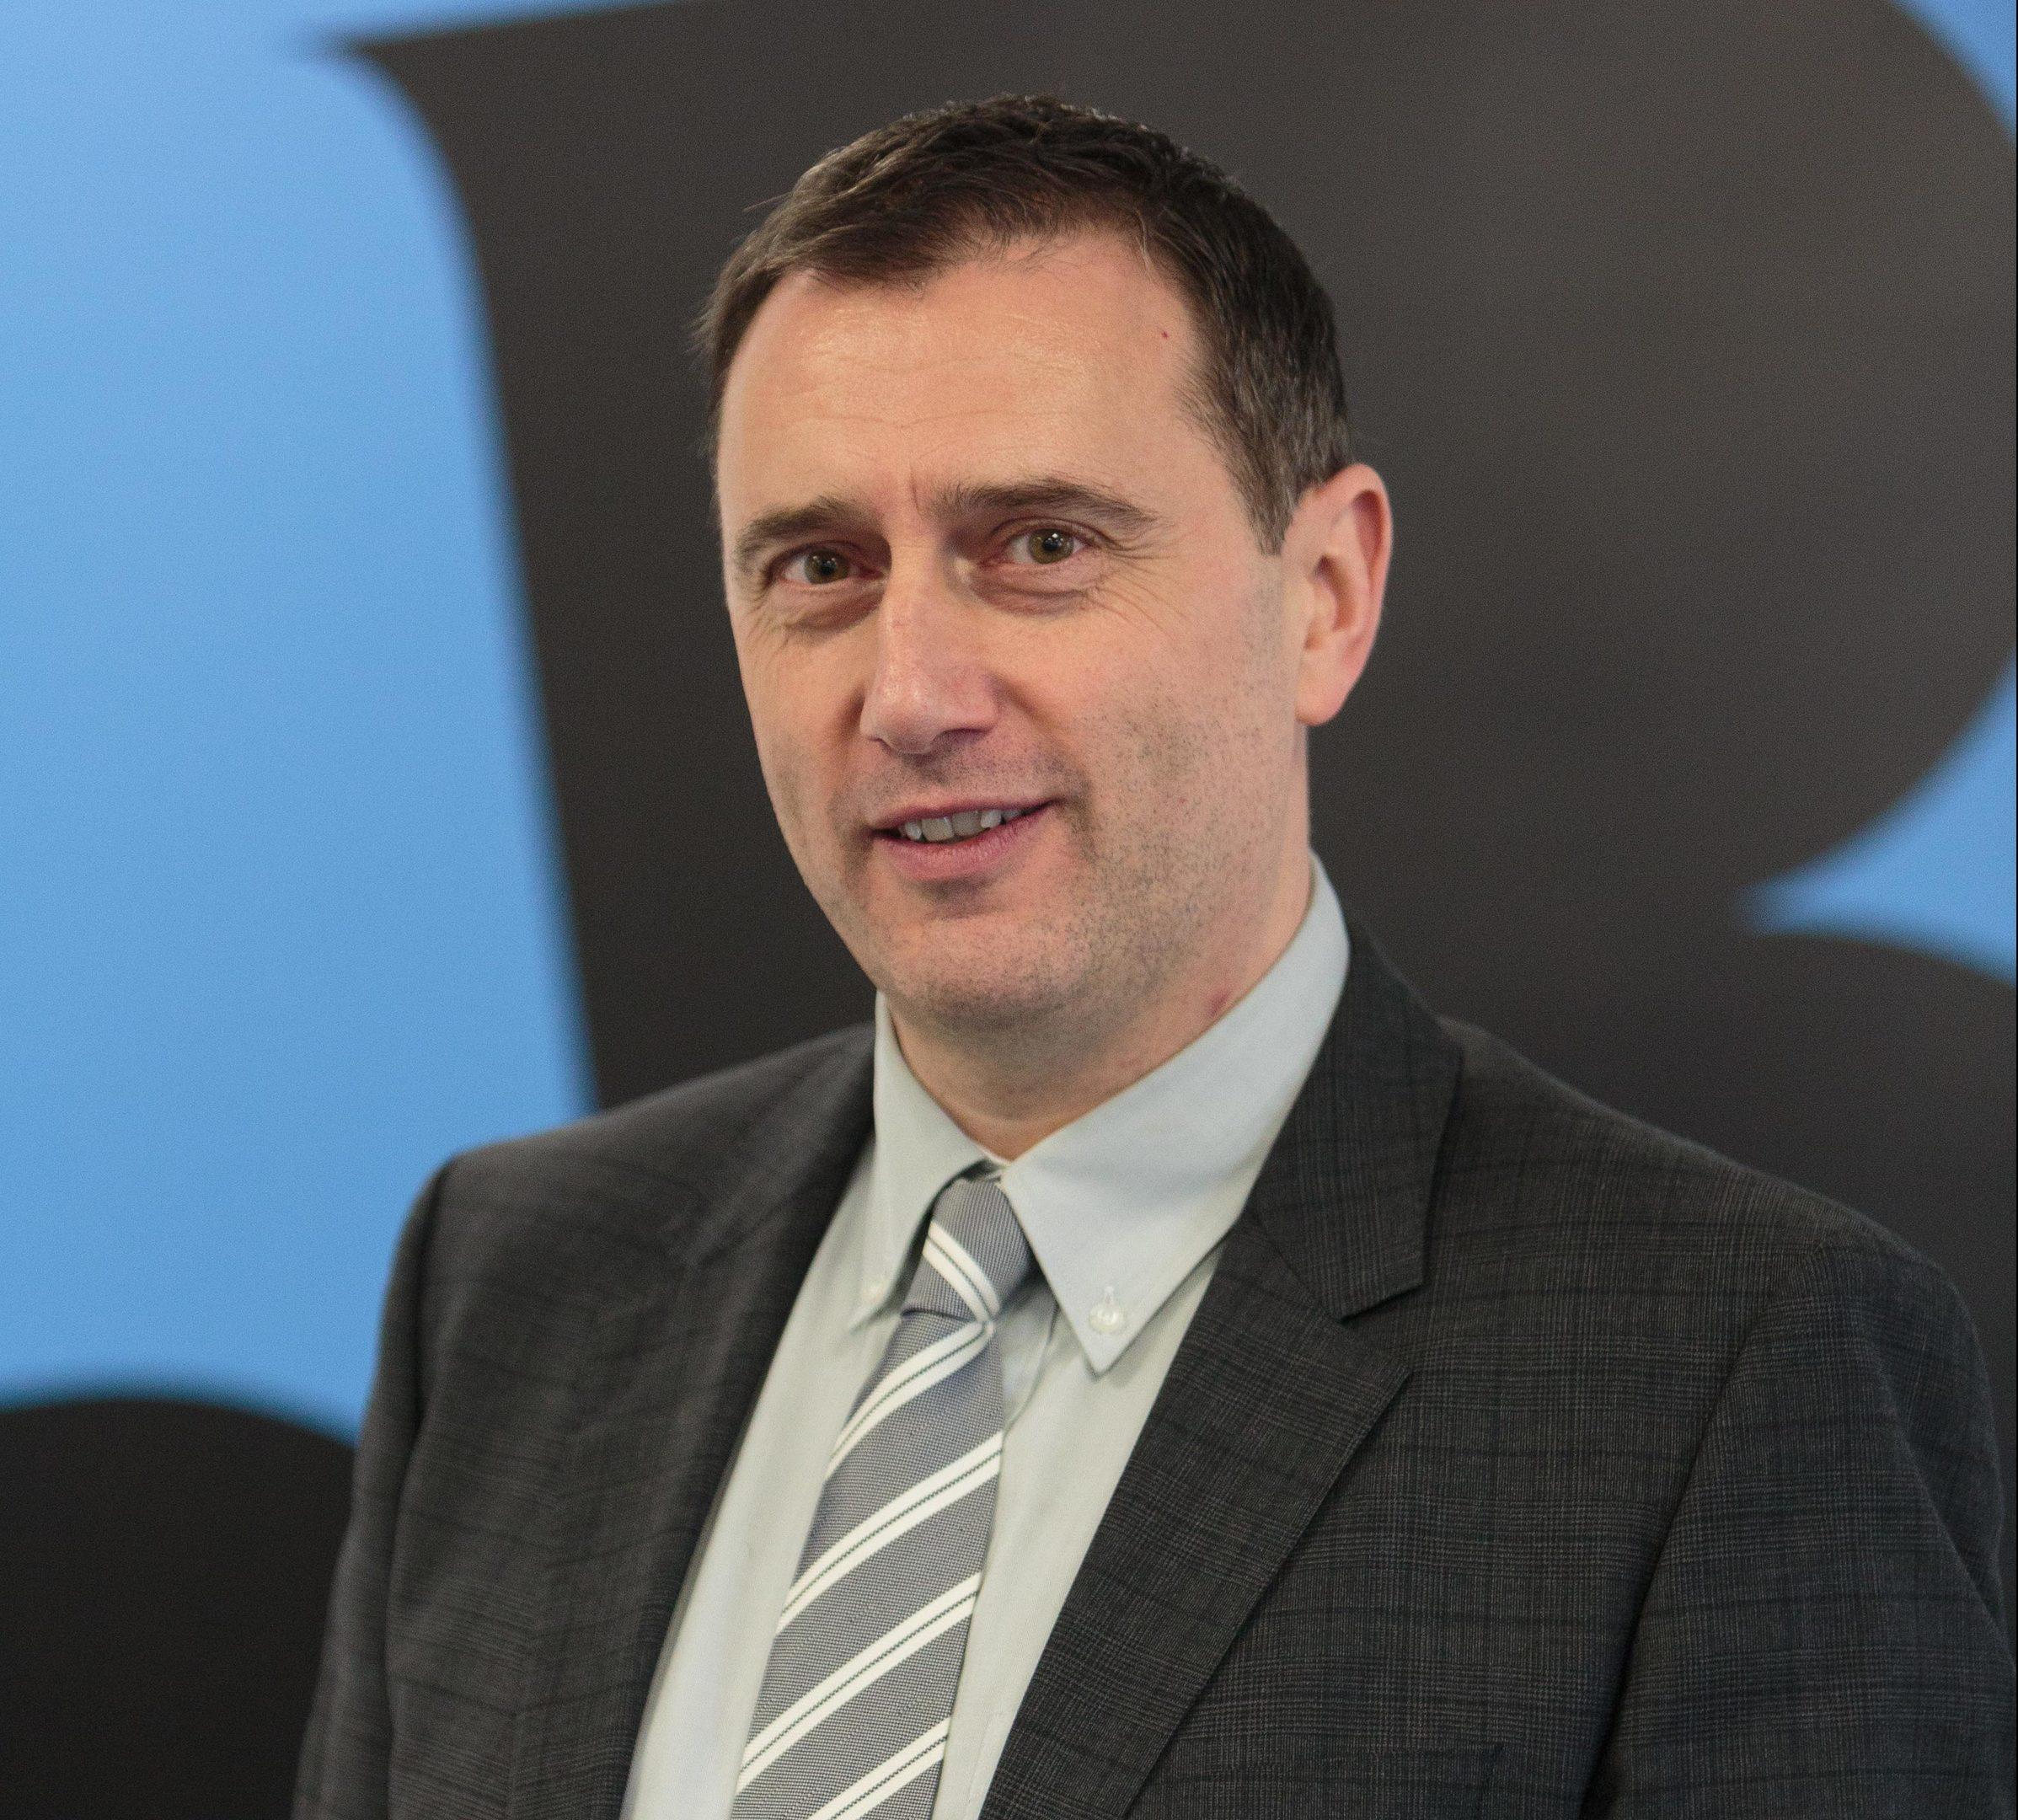 Russell Borthwick, chief executive AGCC